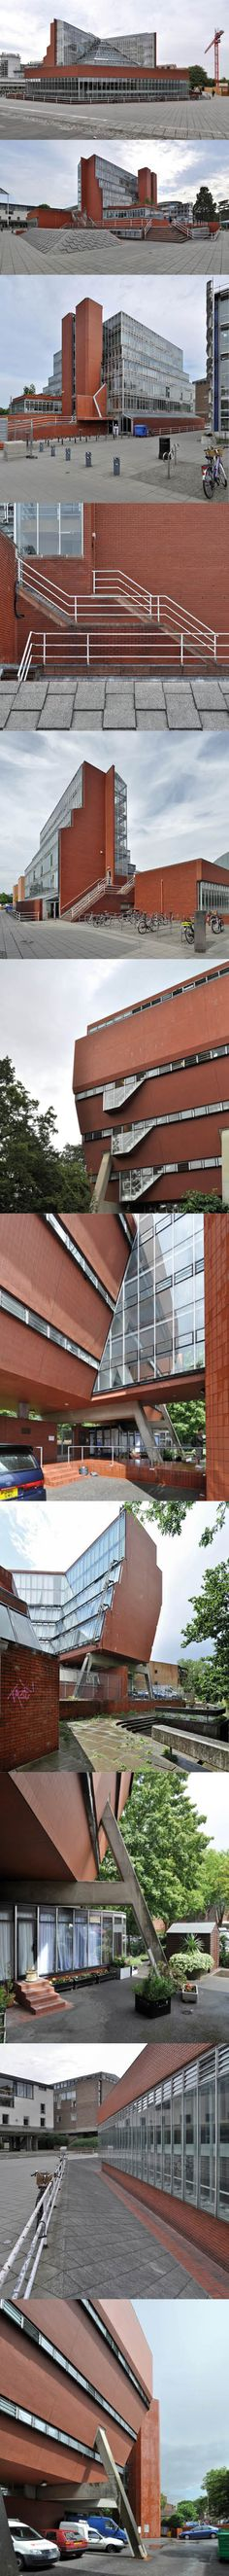 1964-1967 James Stirling - Cambridge University History Faculty Building / UK / brick glass / education